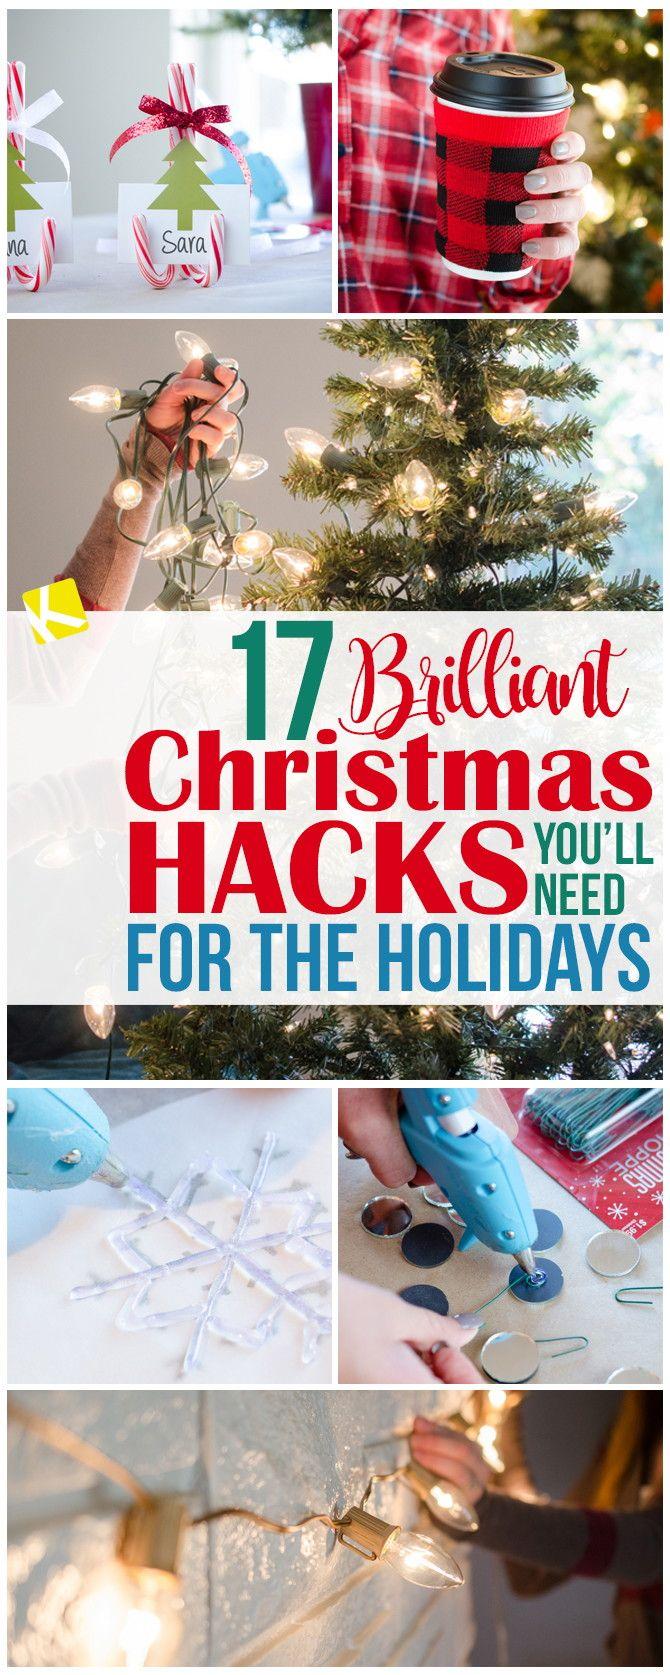 17 Brilliant Christmas Hacks You'll Need for the Holidays -   15 holiday Hacks good ideas